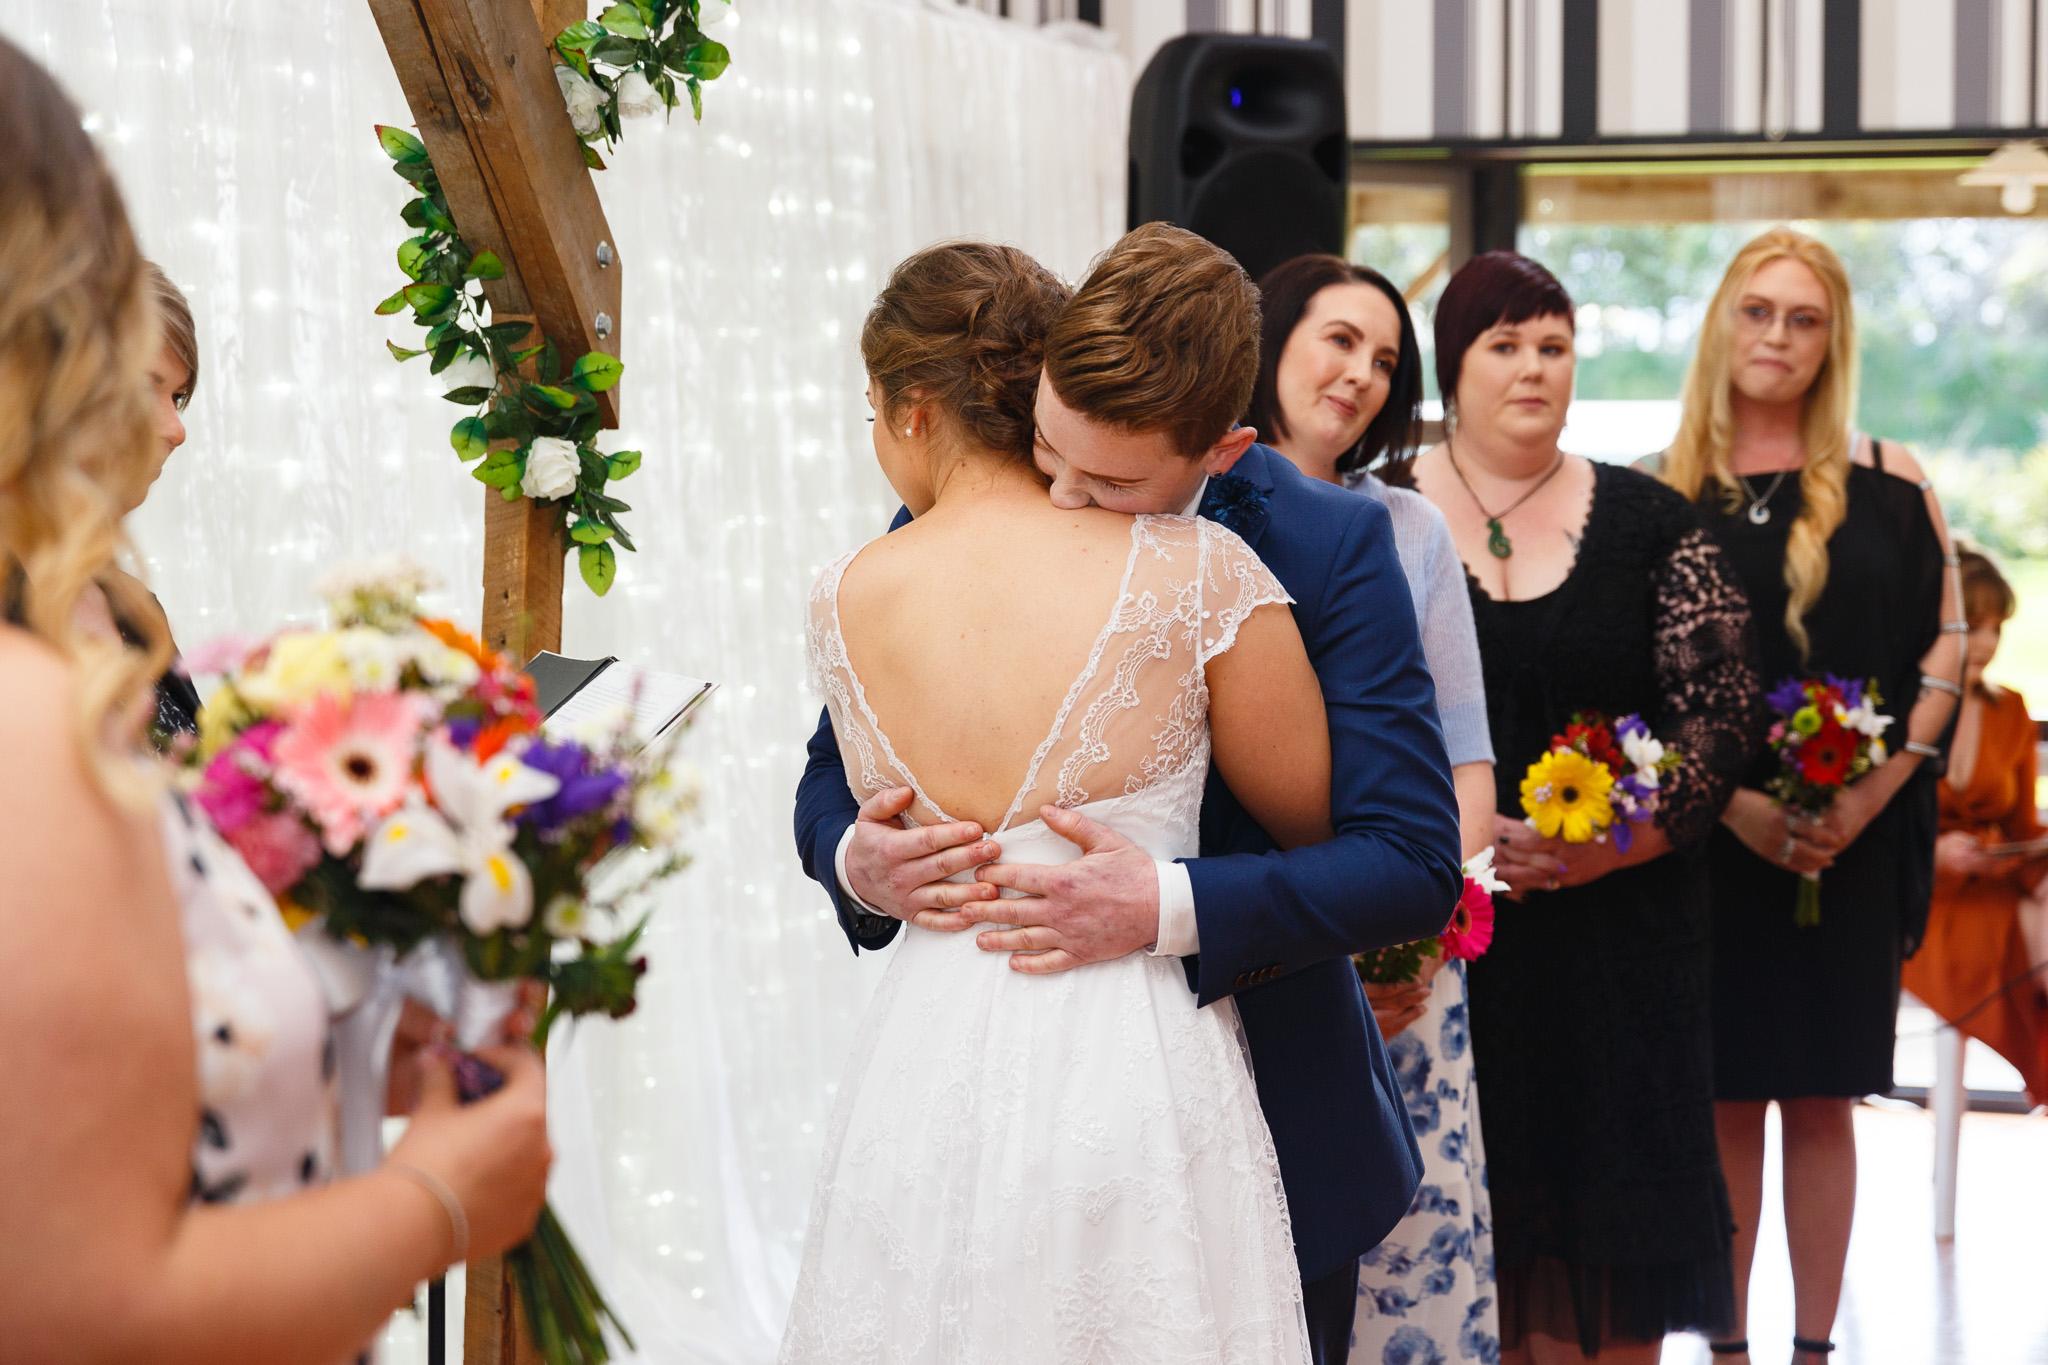 palmerston-north-wedding-photography-highlight-new-zealand.jpg.jpg